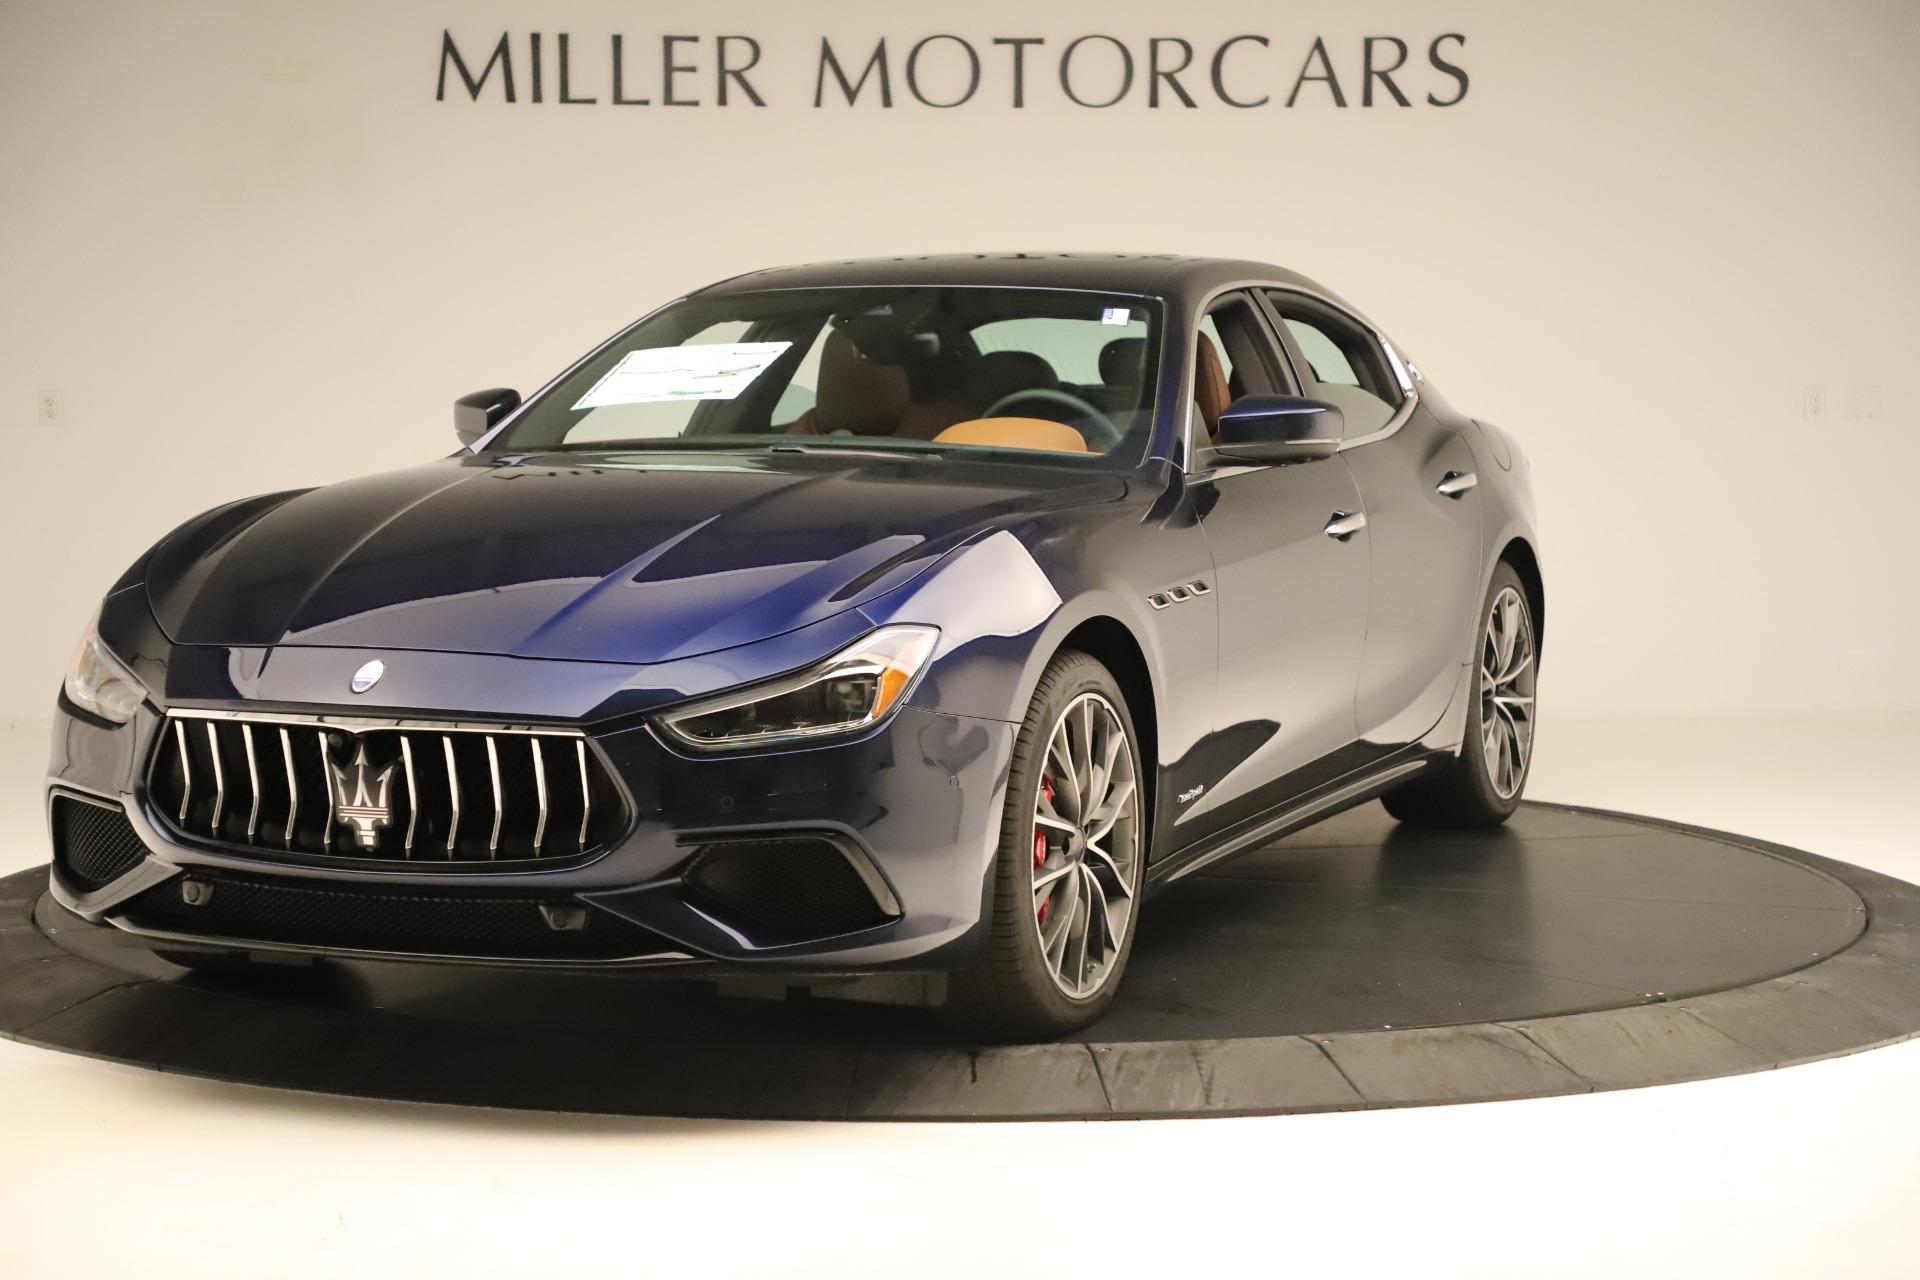 New 2019 Maserati Ghibli S Q4 GranSport For Sale In Greenwich, CT 2949_main